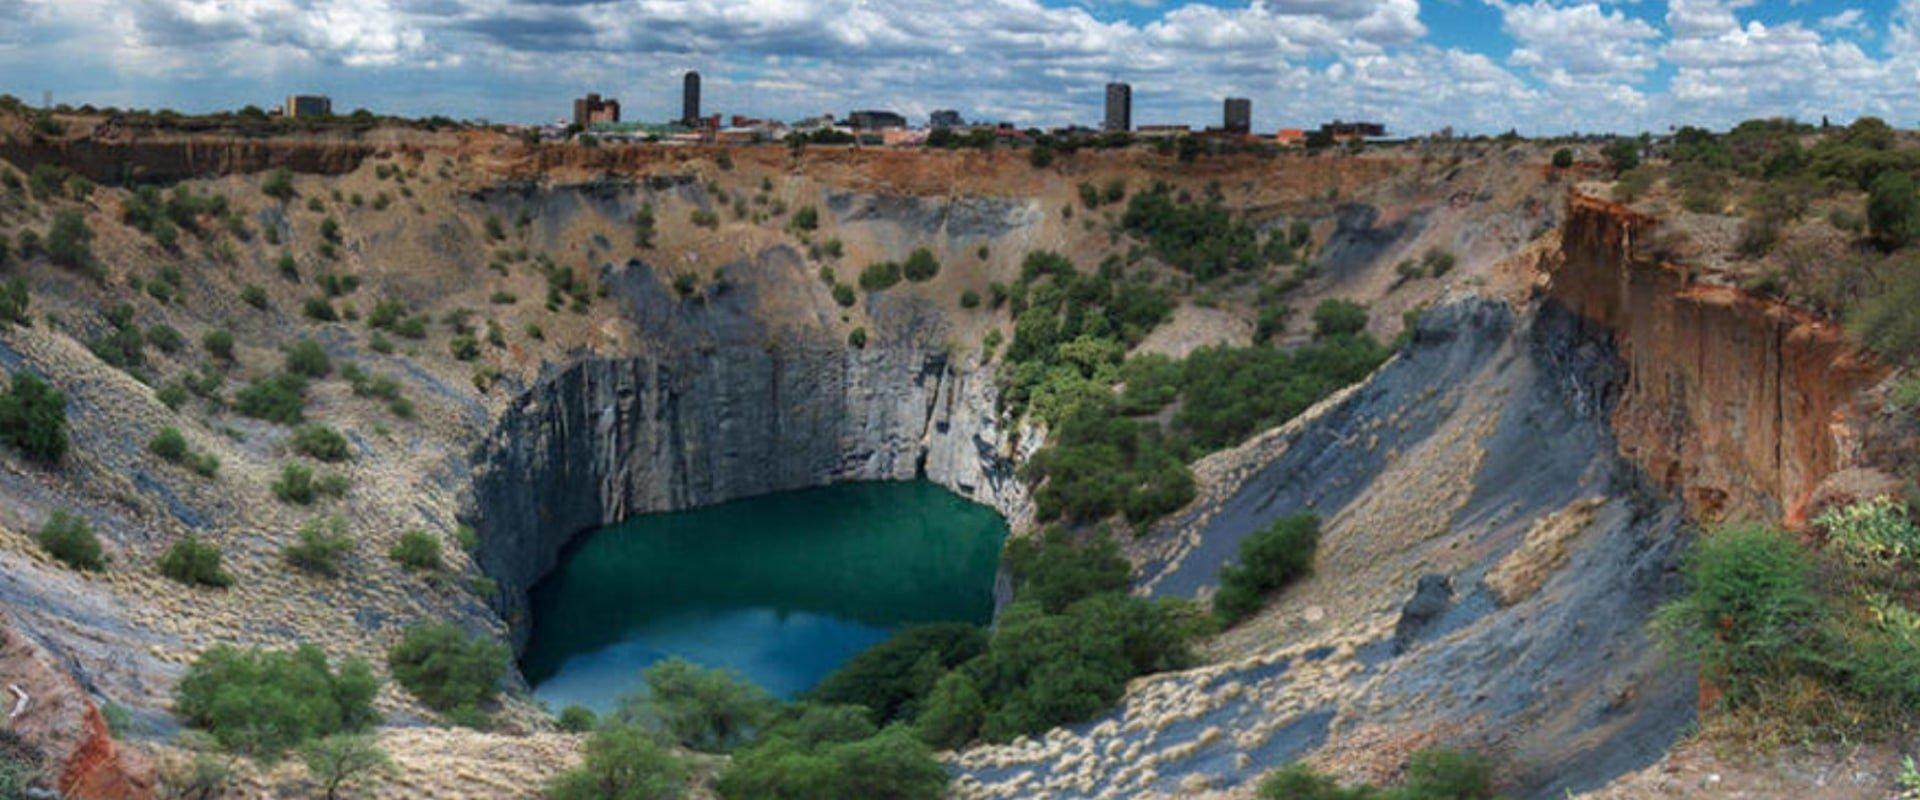 Visit the Diamond Mine Museum